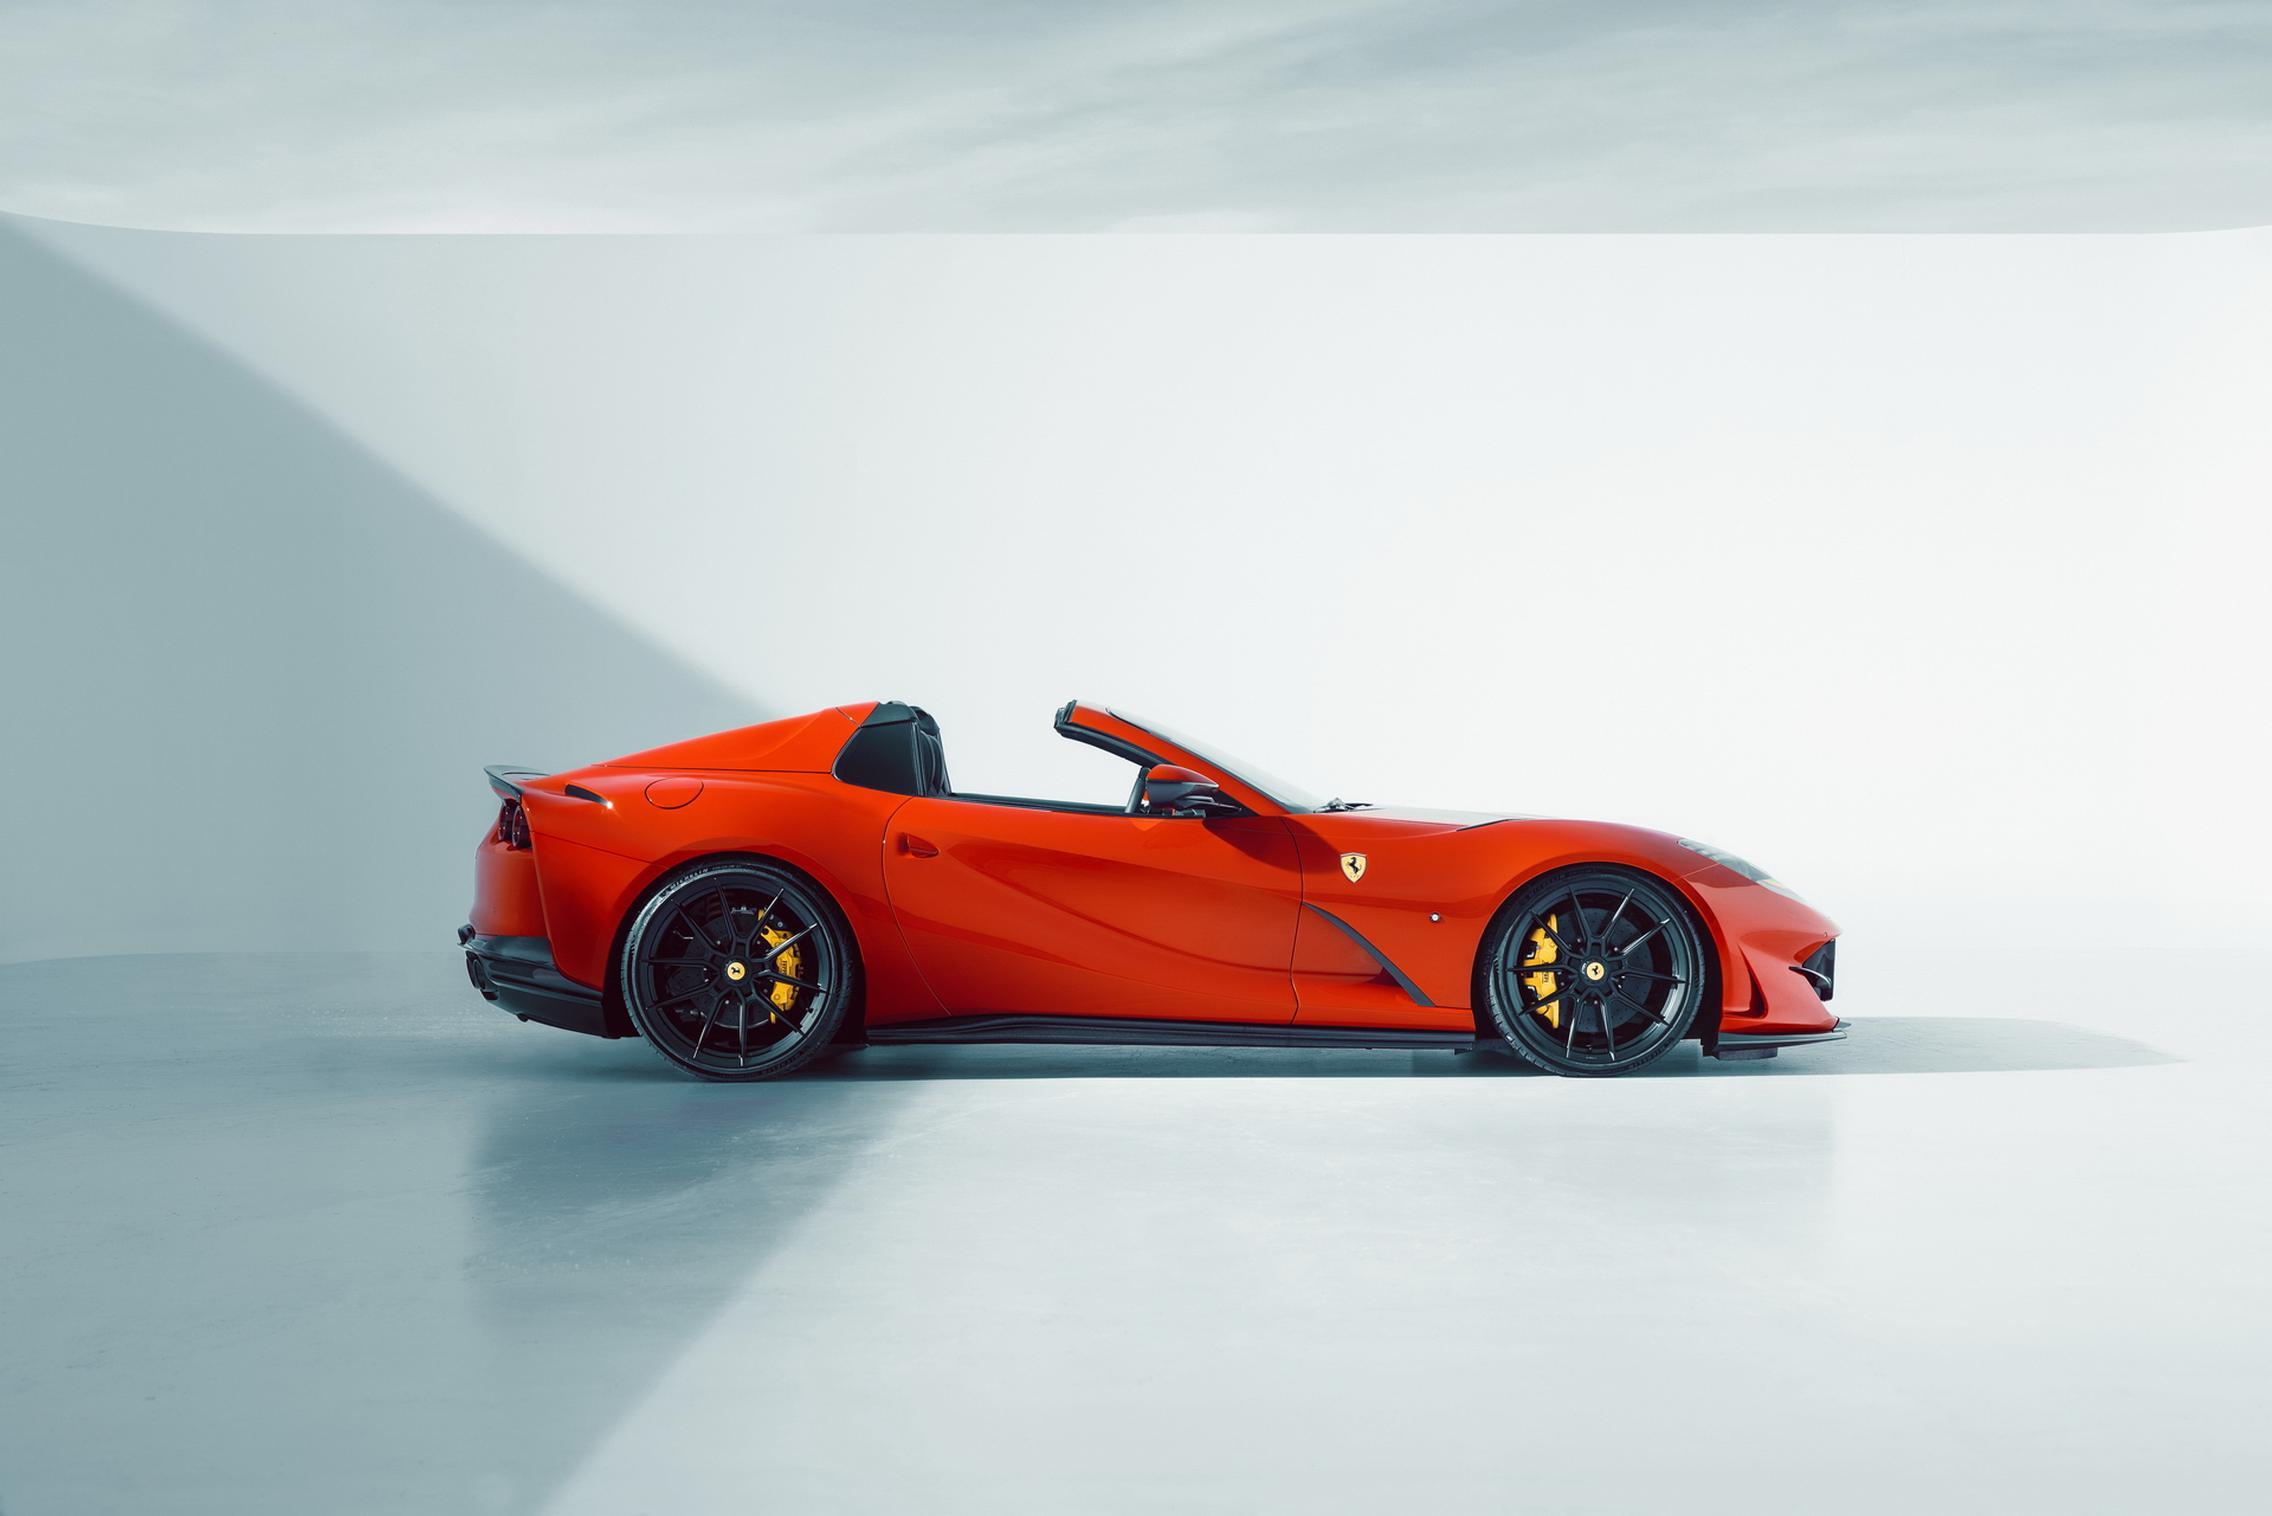 Novitec Ferrari 812 GTS roof down